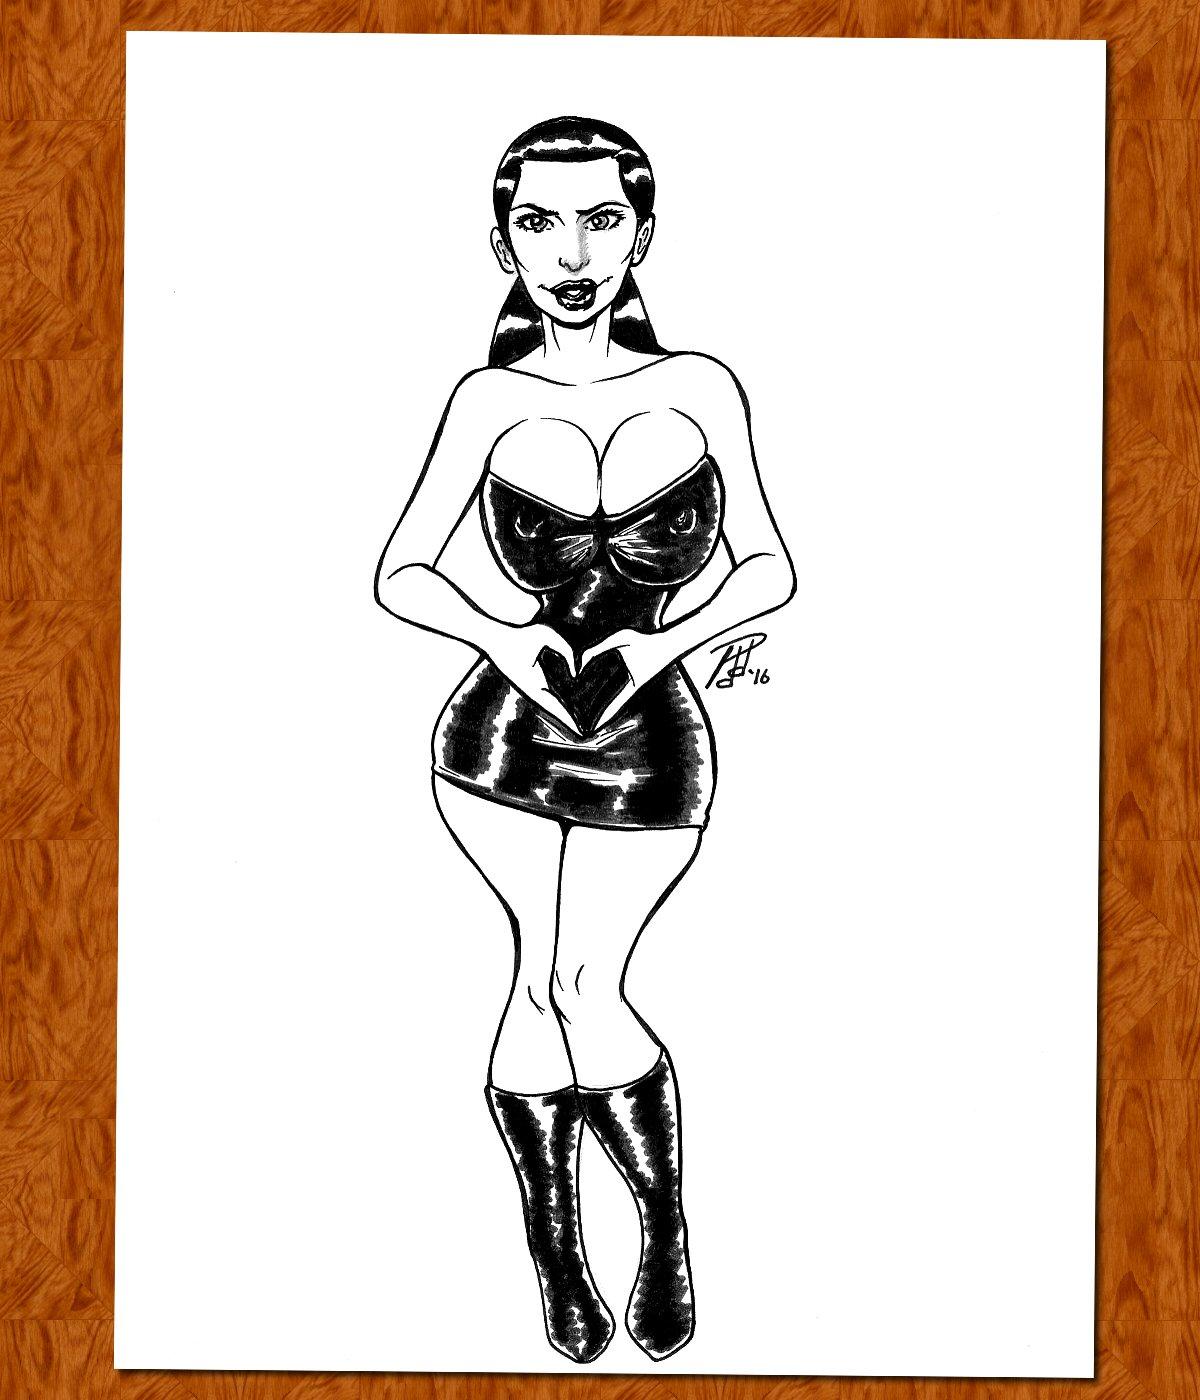 Kim Kardashian Comic Art Original Pinup Pen and Ink Drawing (OOAK)